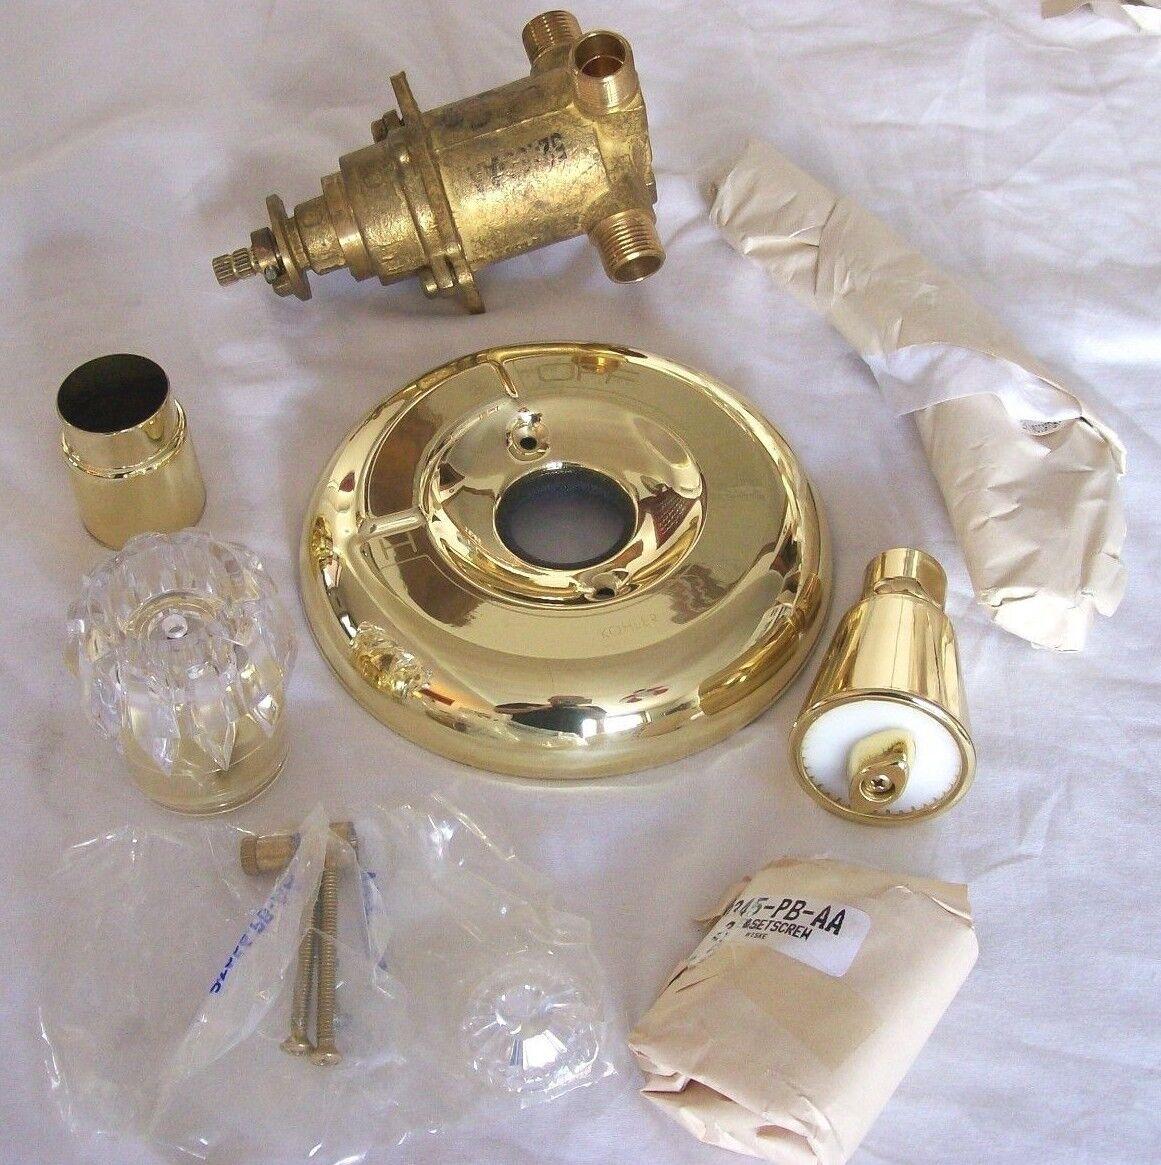 Kohler Single Handle Shower Faucet Polished Brass 6215 Pb Brass Rite Temp Valve